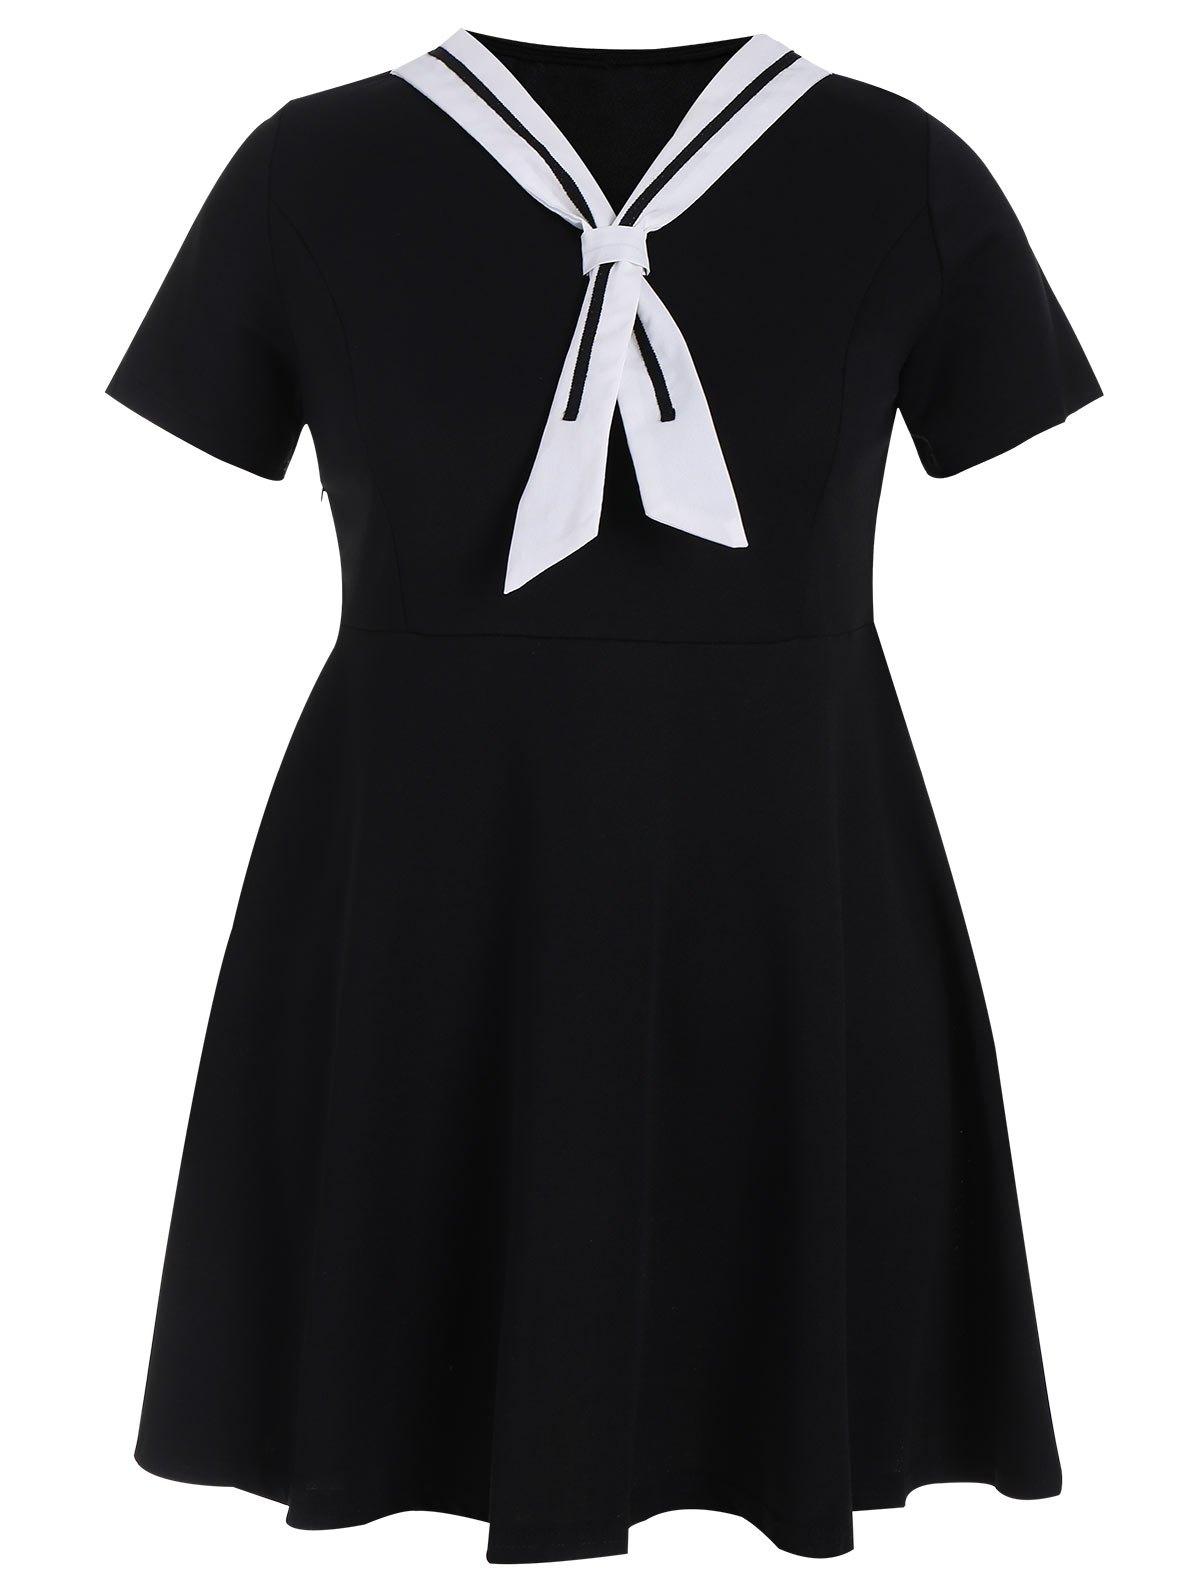 Plus Size Tied Skater Sailor Dress